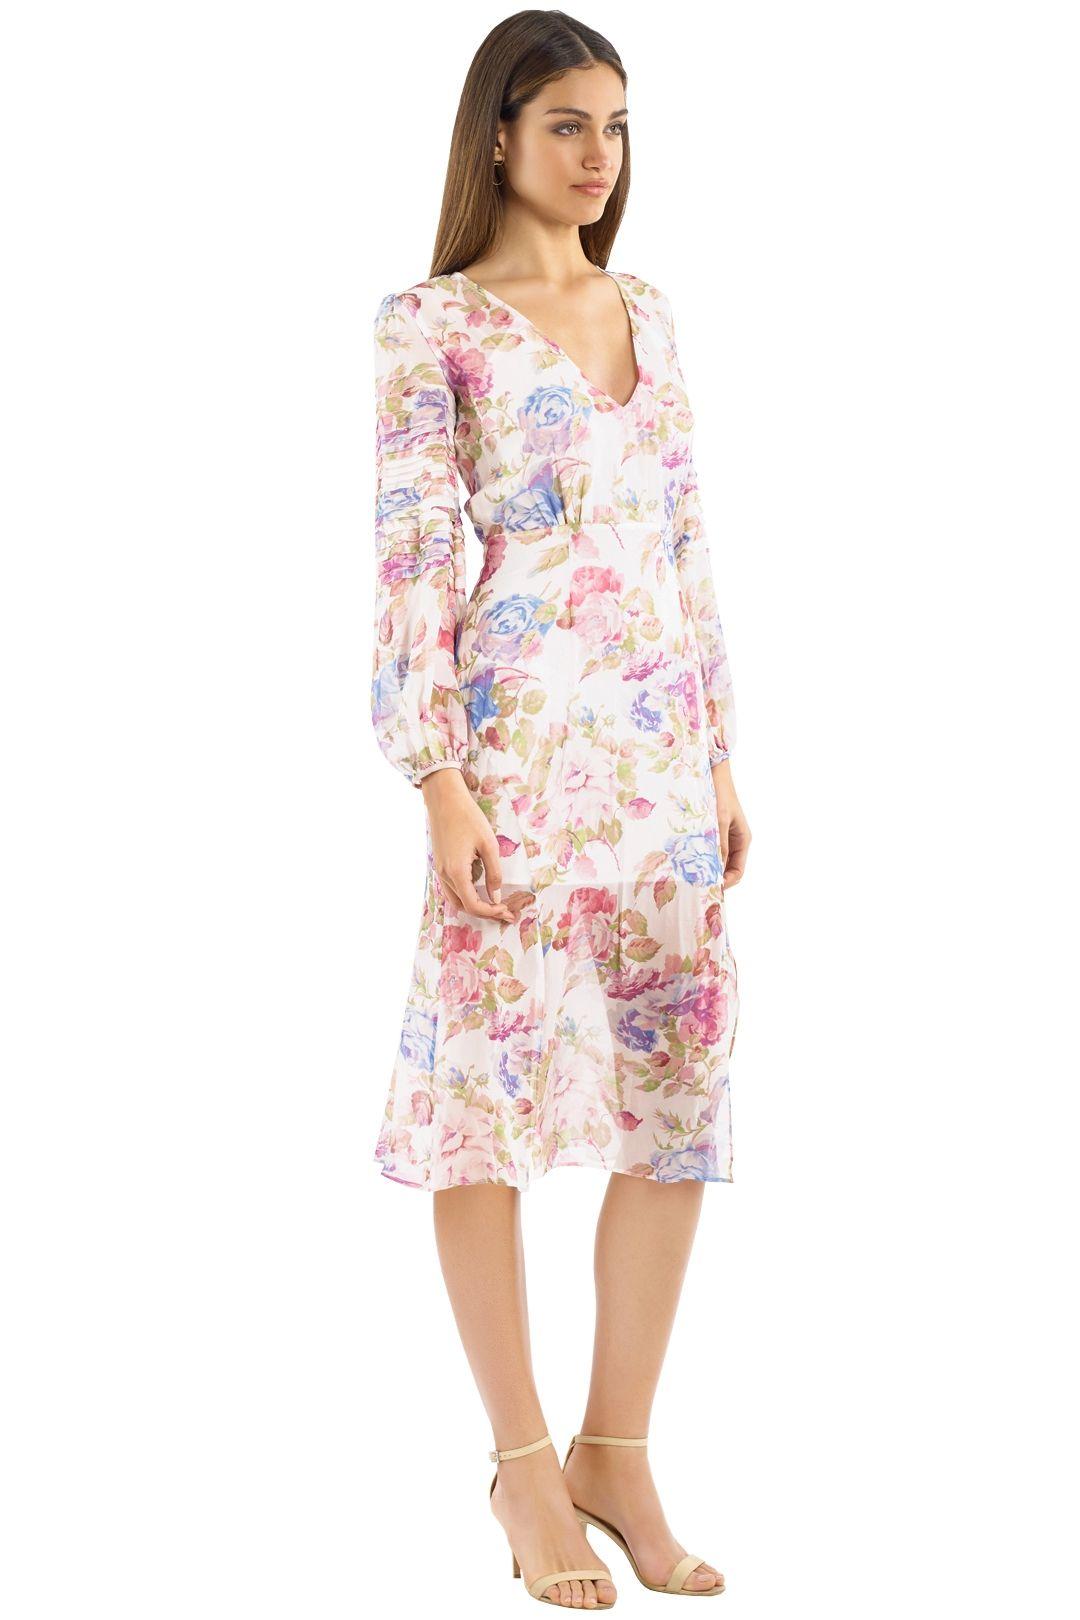 Talulah - Epiphany Midi Dress - Pink Multi - Side